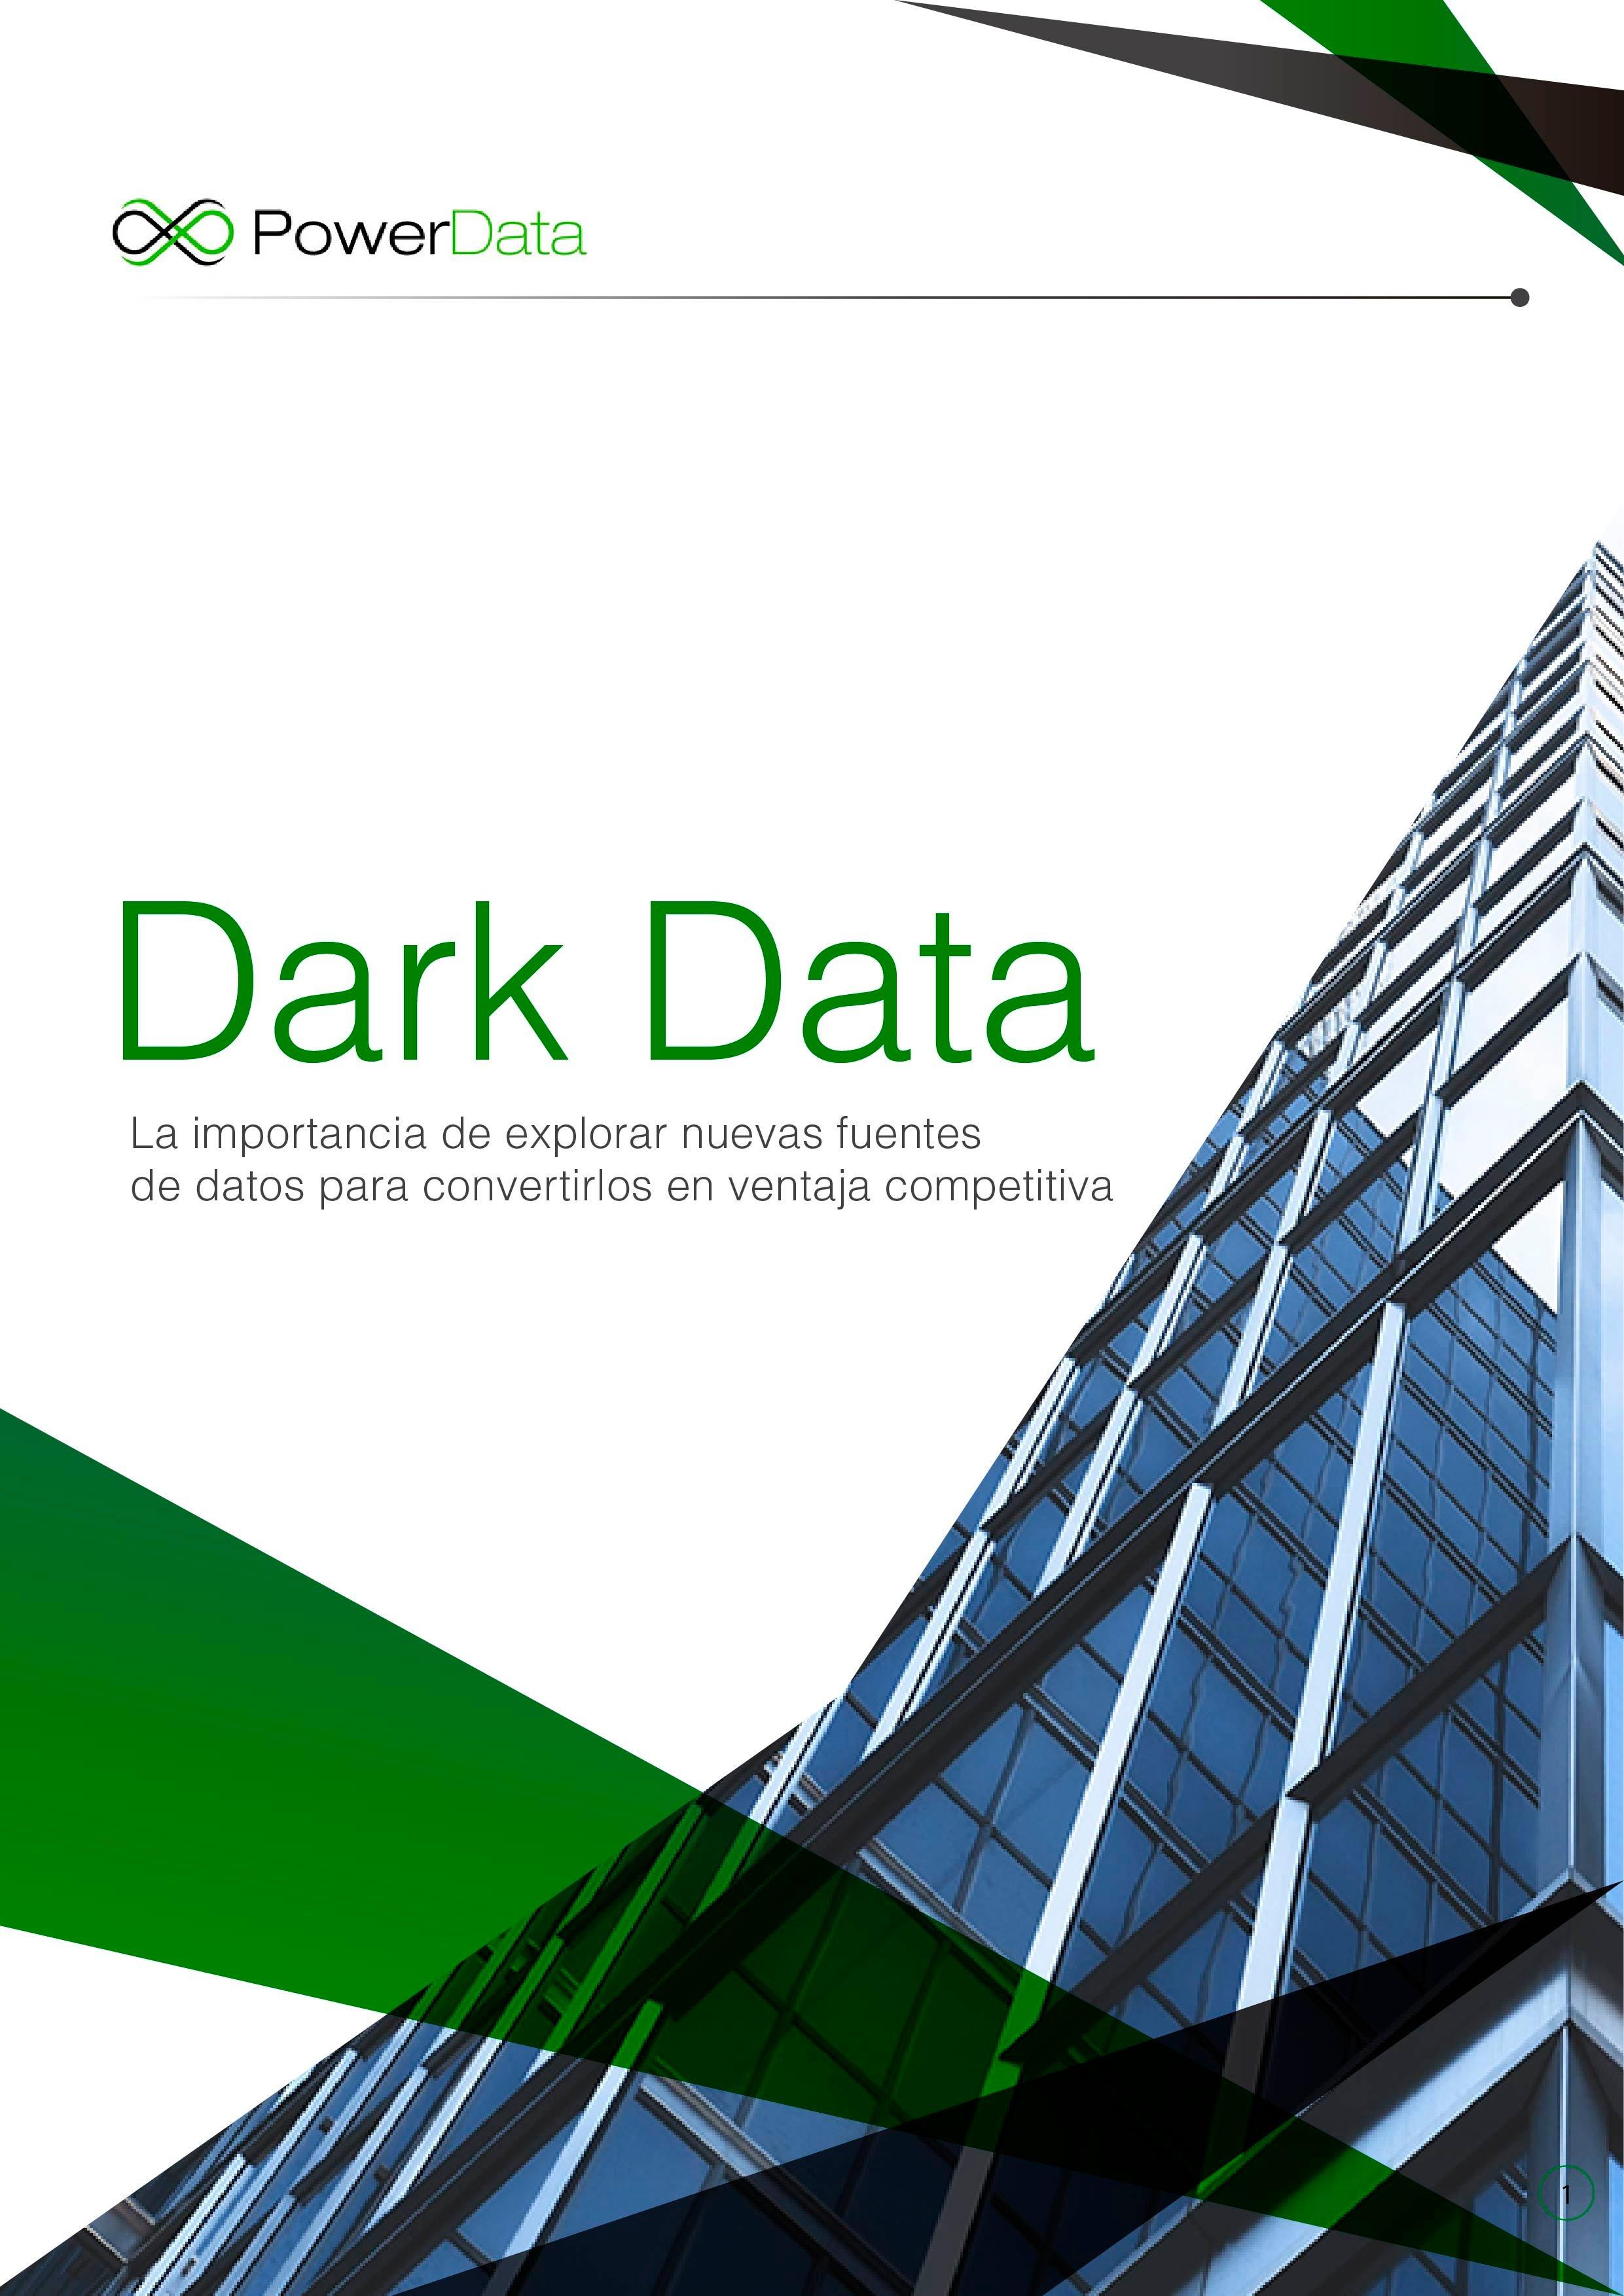 Portada Dark Data-01